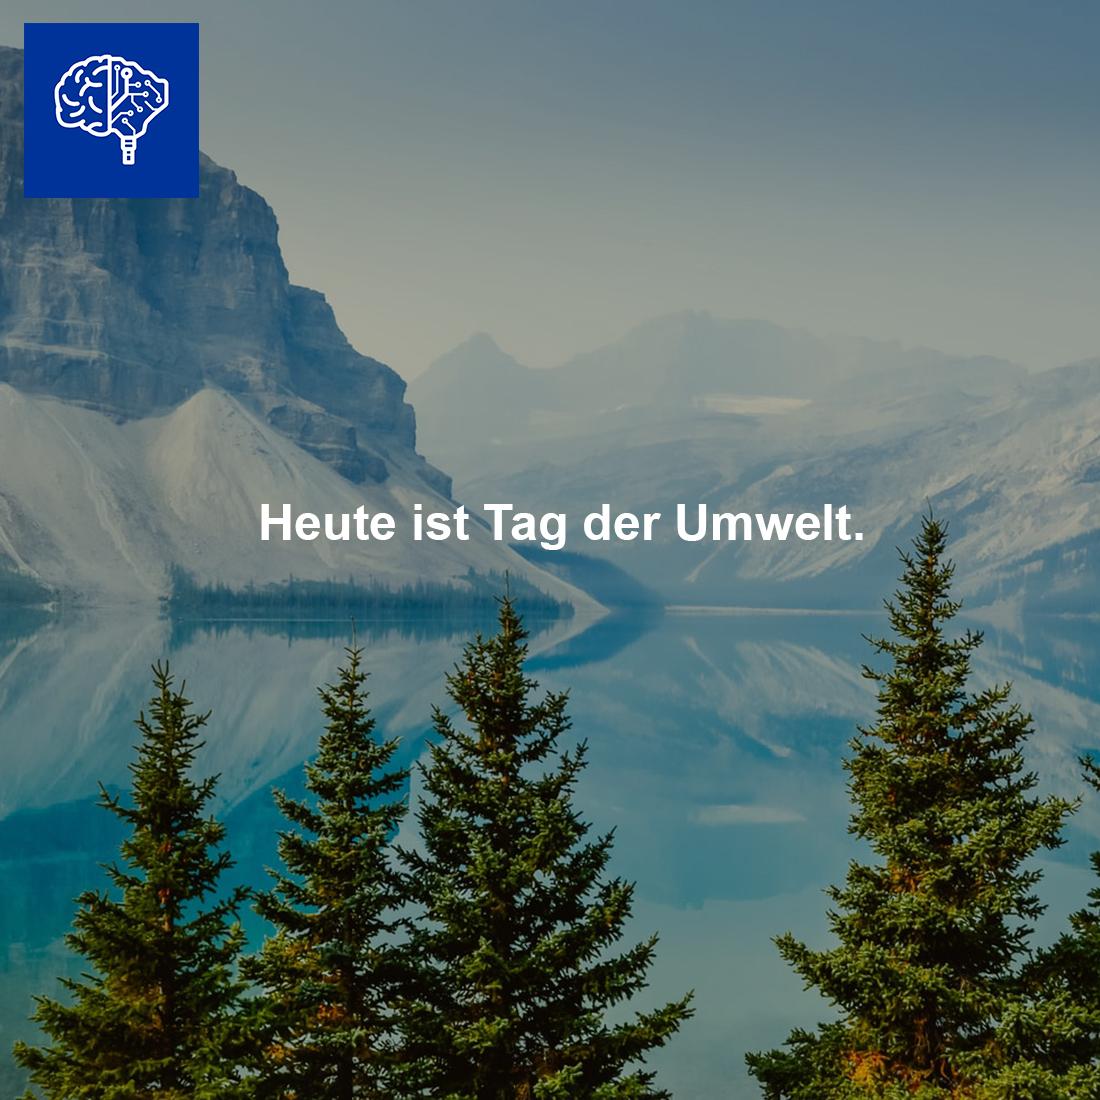 #tagderumwelt